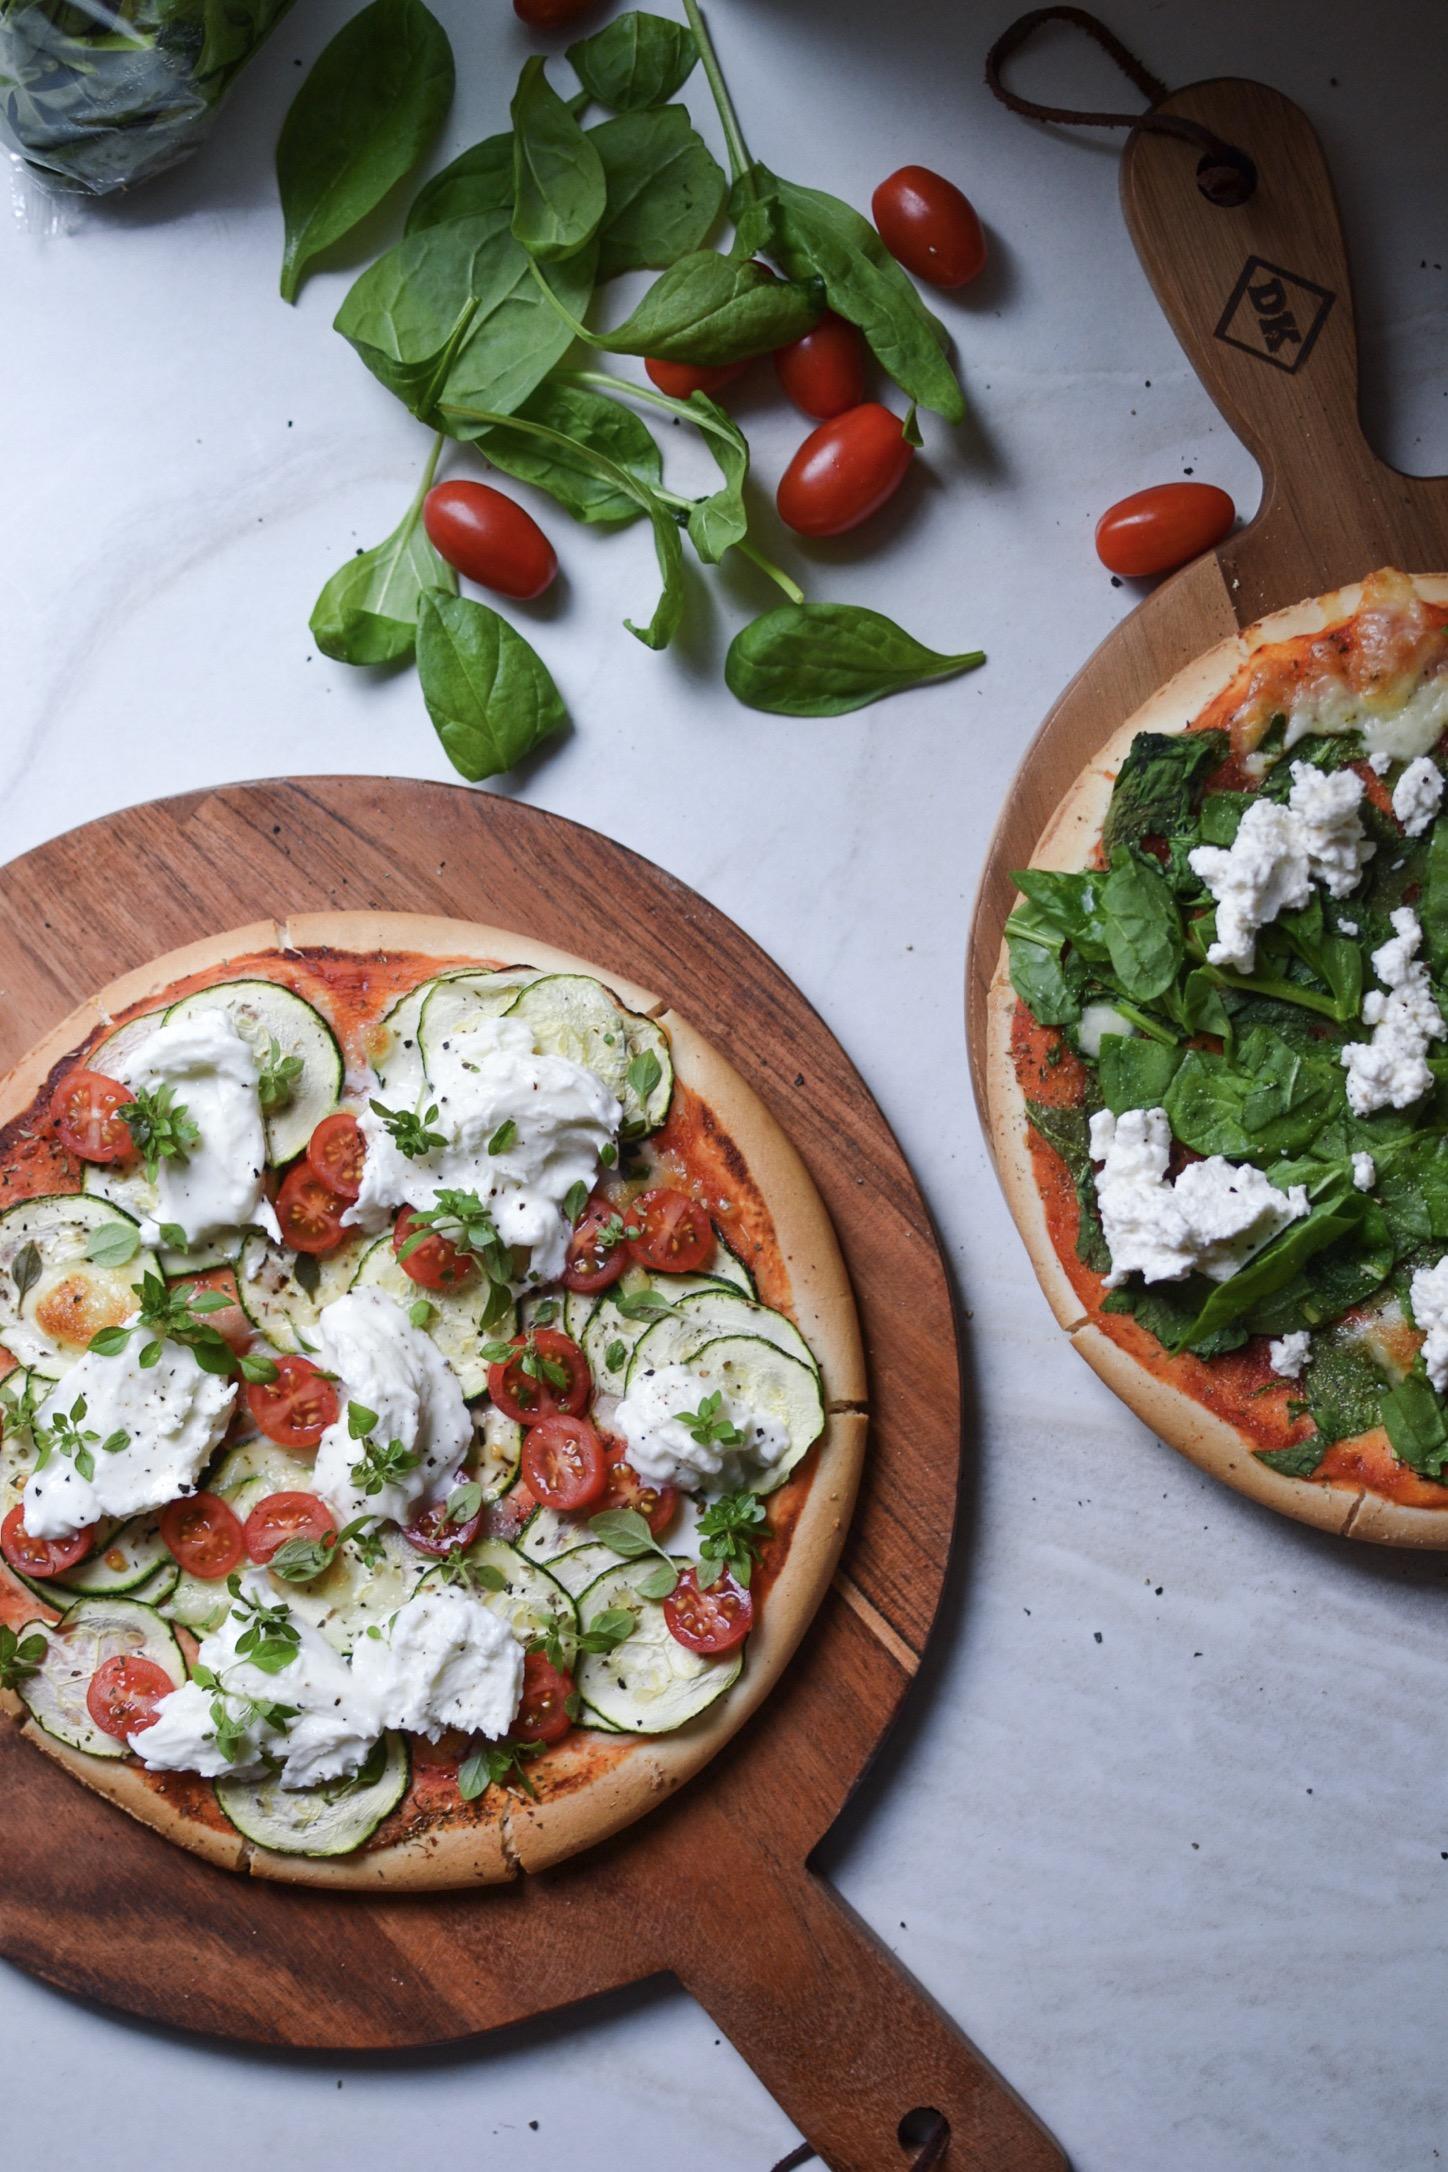 1 journée sans gluten, pizza sans gluten